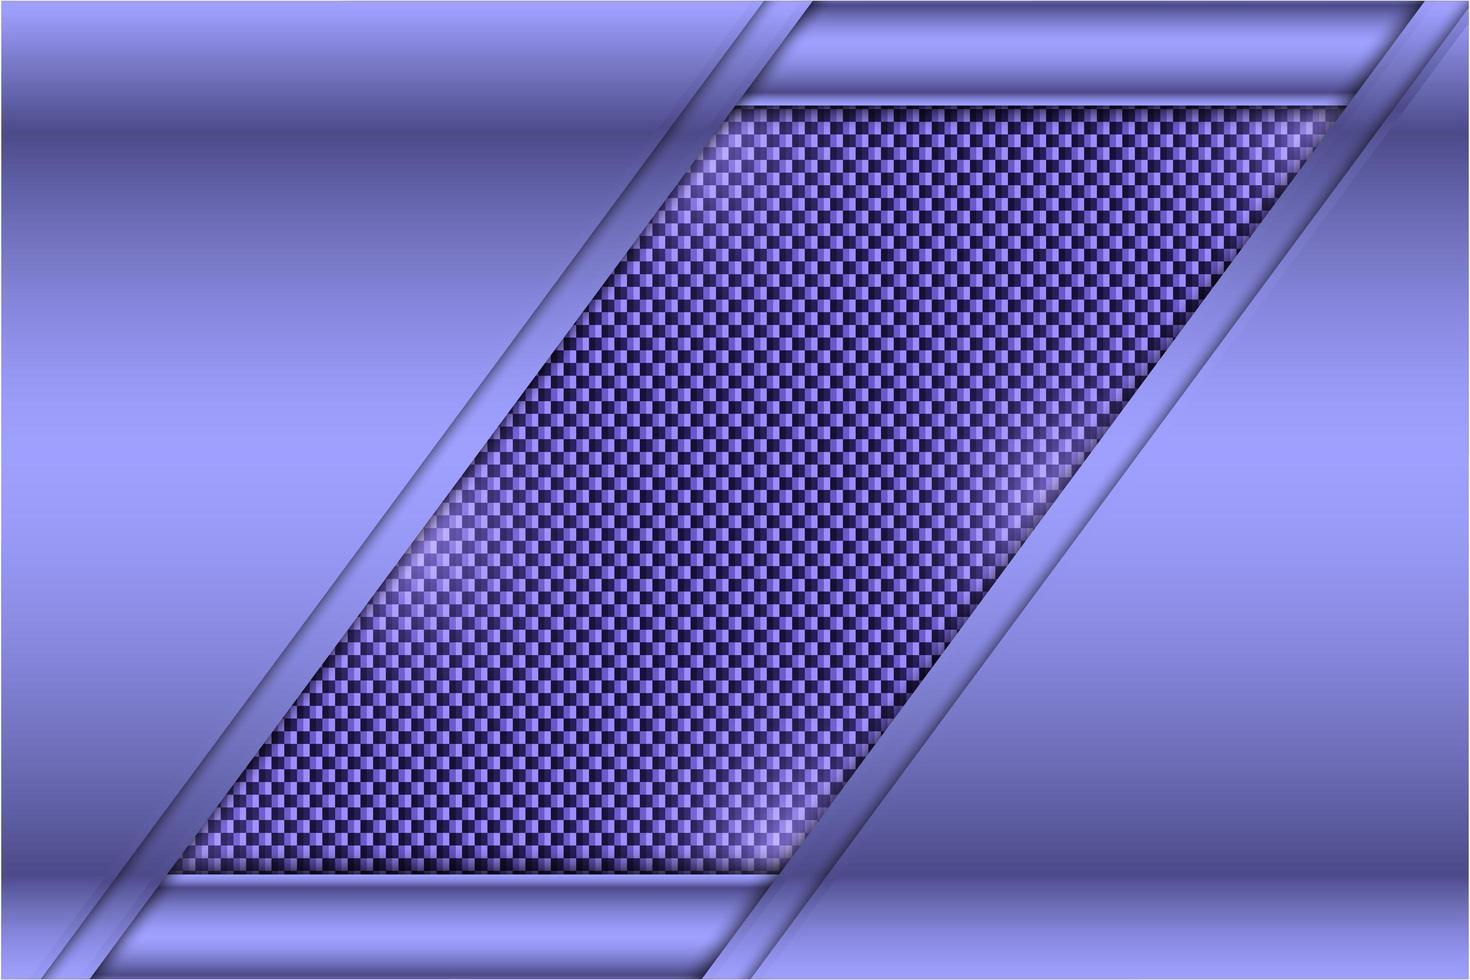 fond métallique avec texture en fibre de carbone vecteur